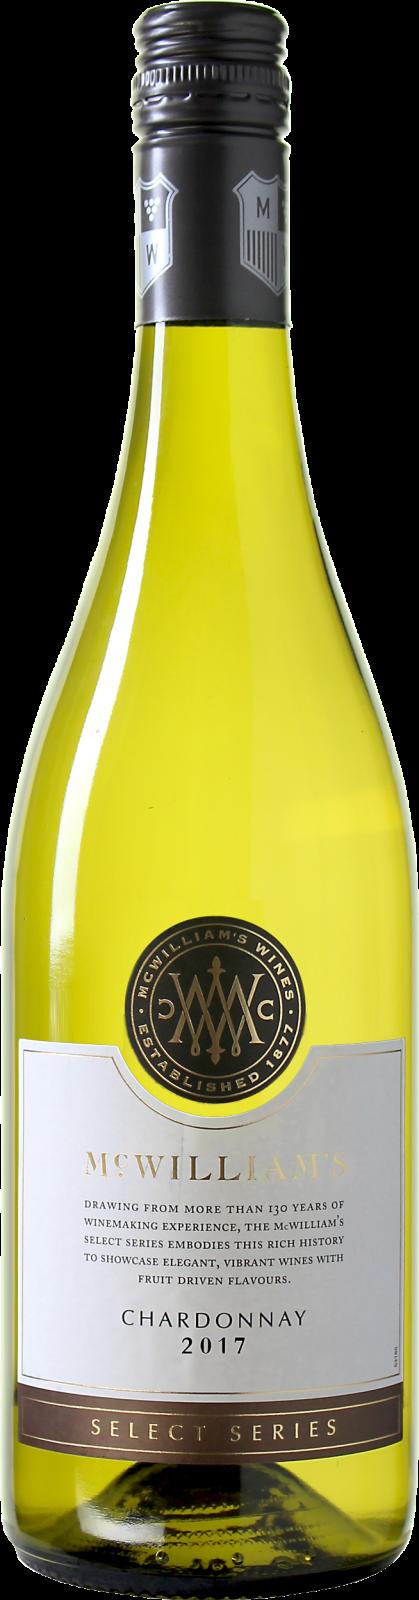 Mc William's Chardonnay